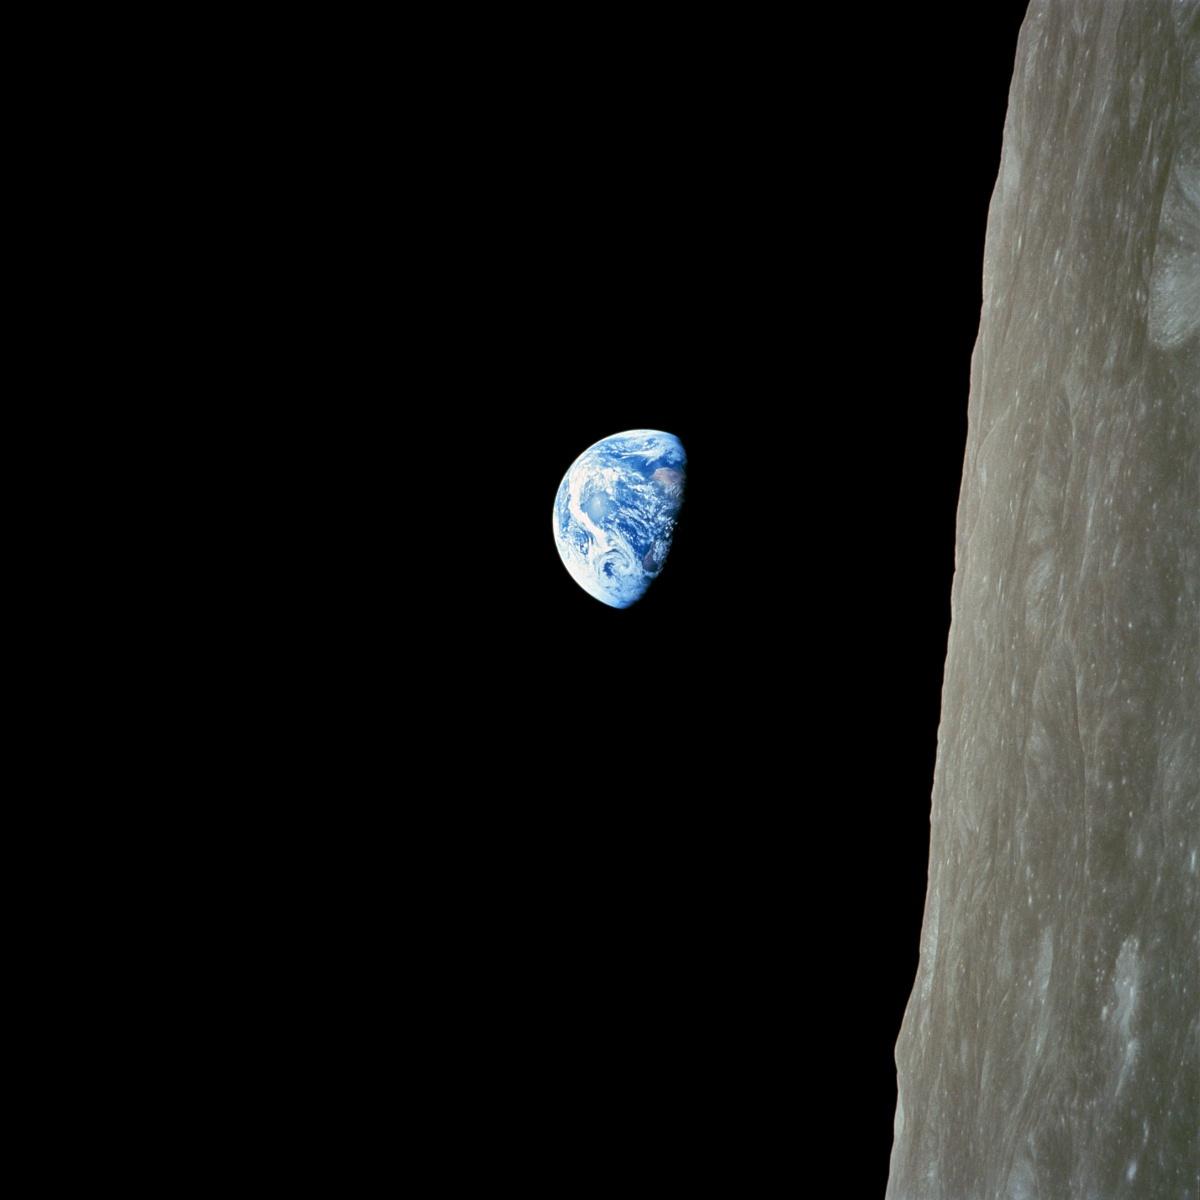 apollo 8 earthrise over moon - photo #9